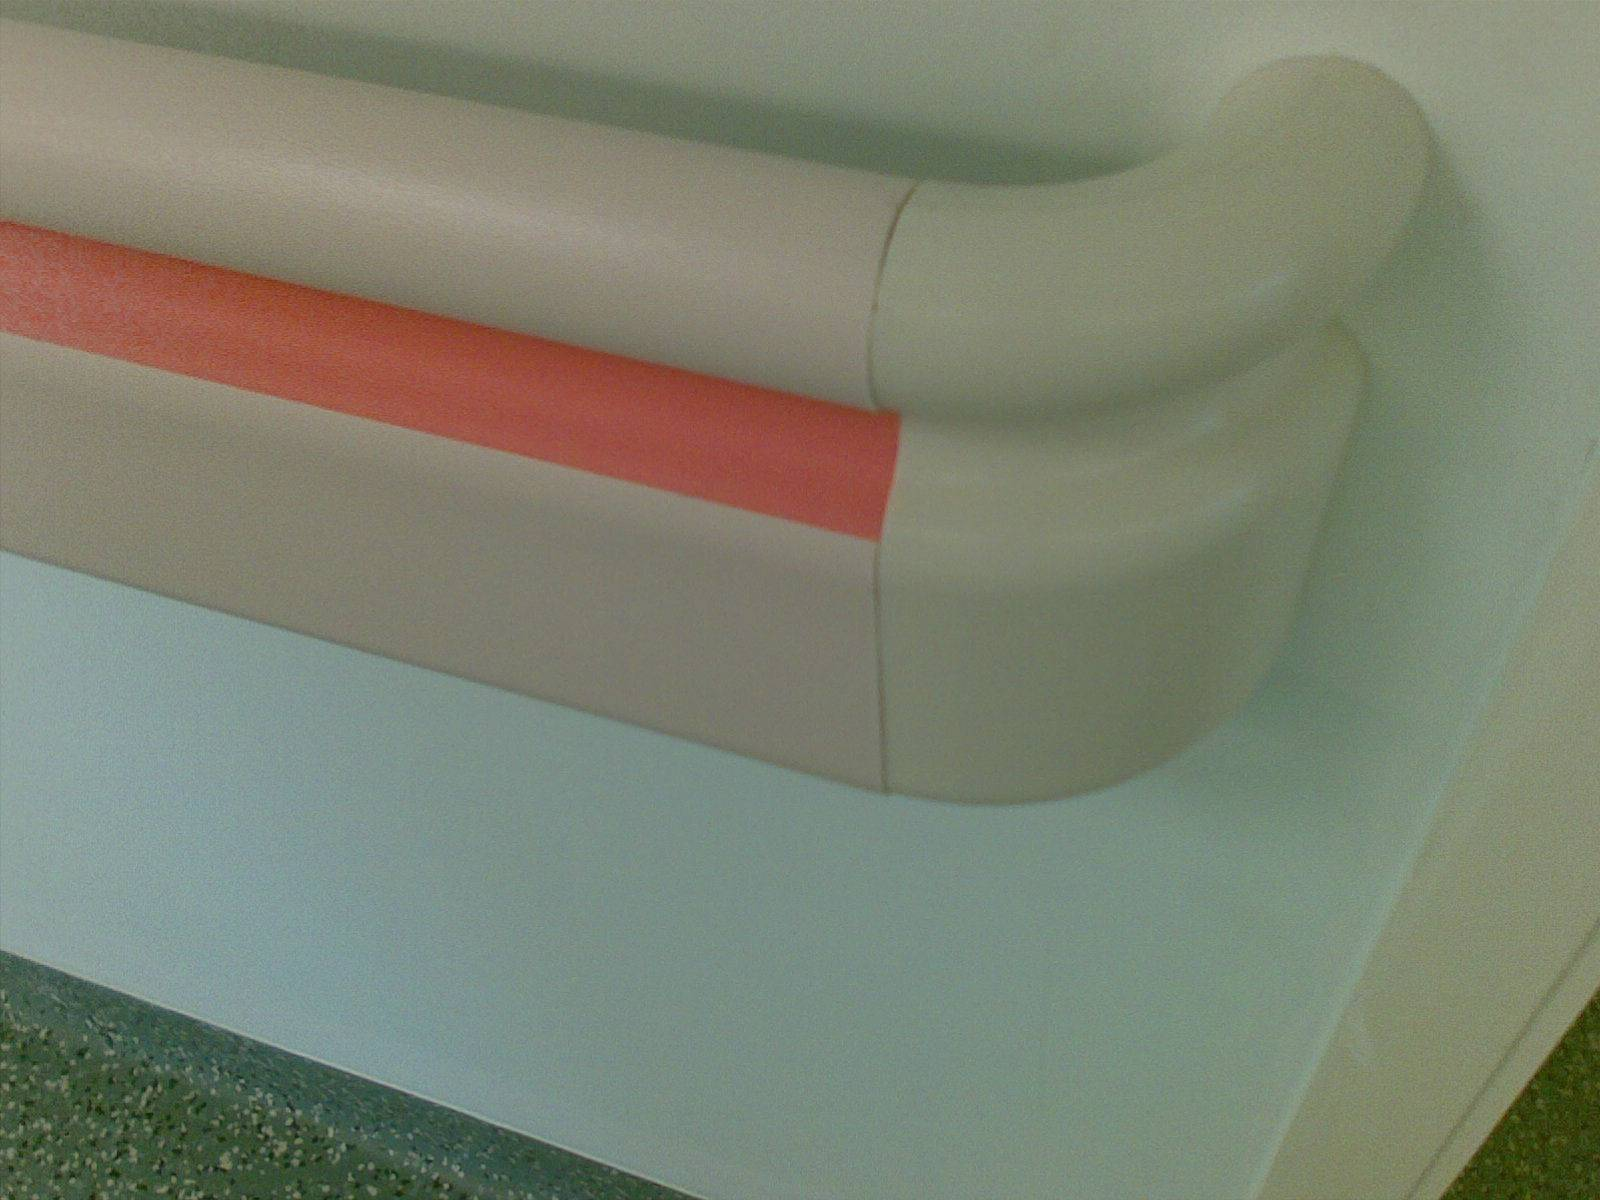 Anti-bumpimg handrails